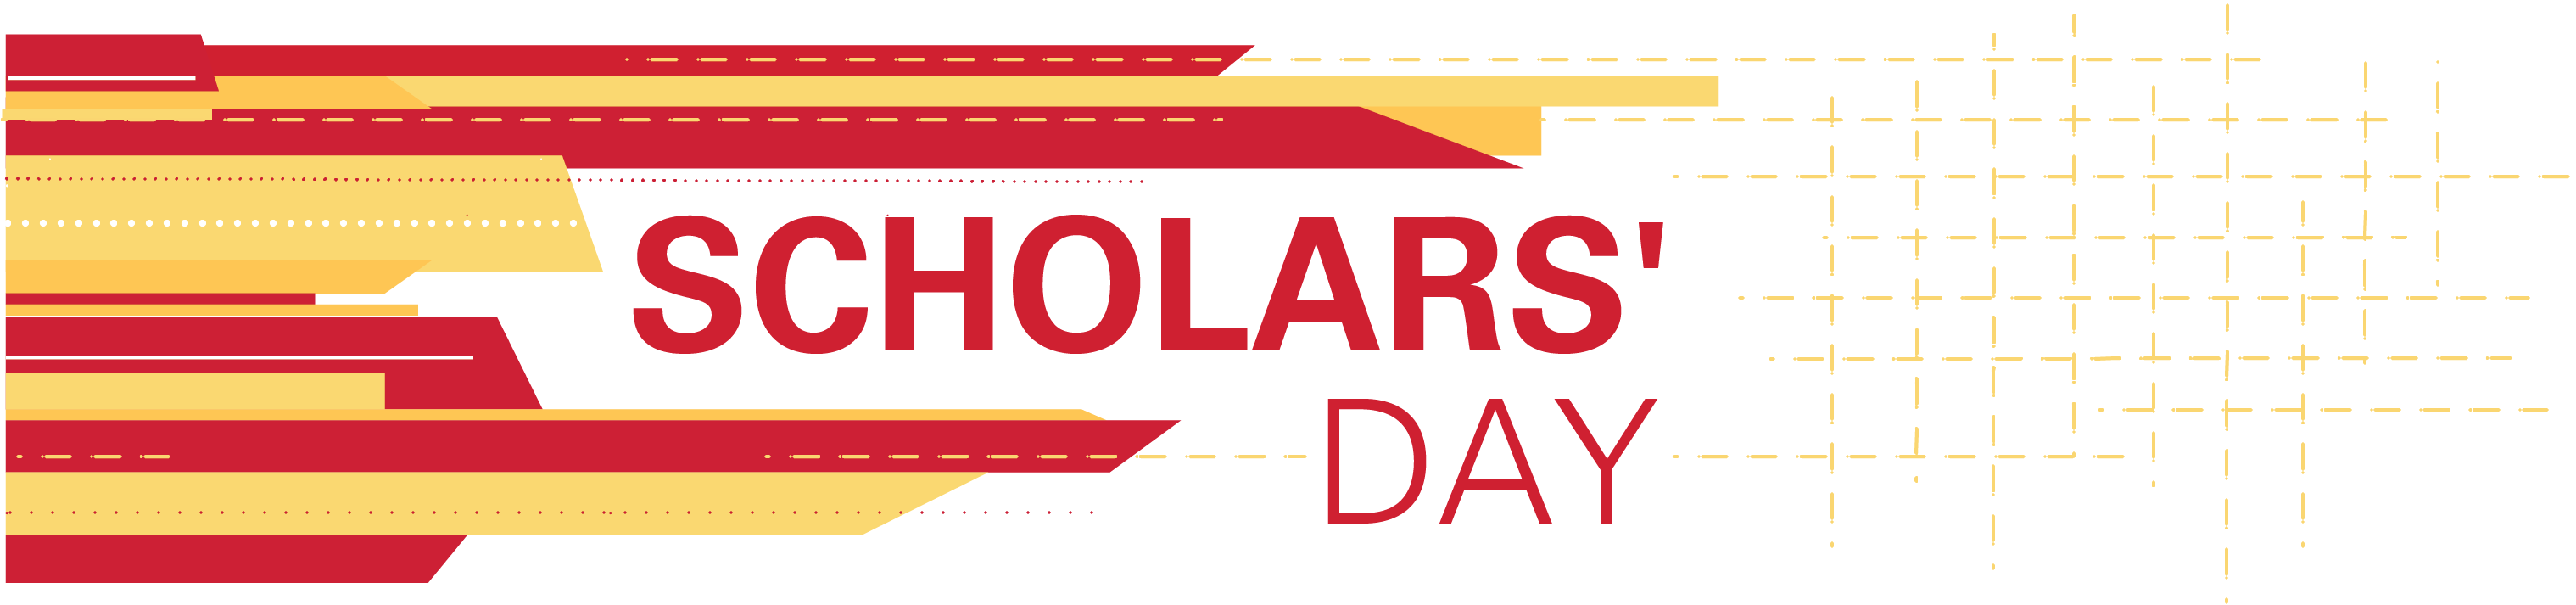 Scholar's Day